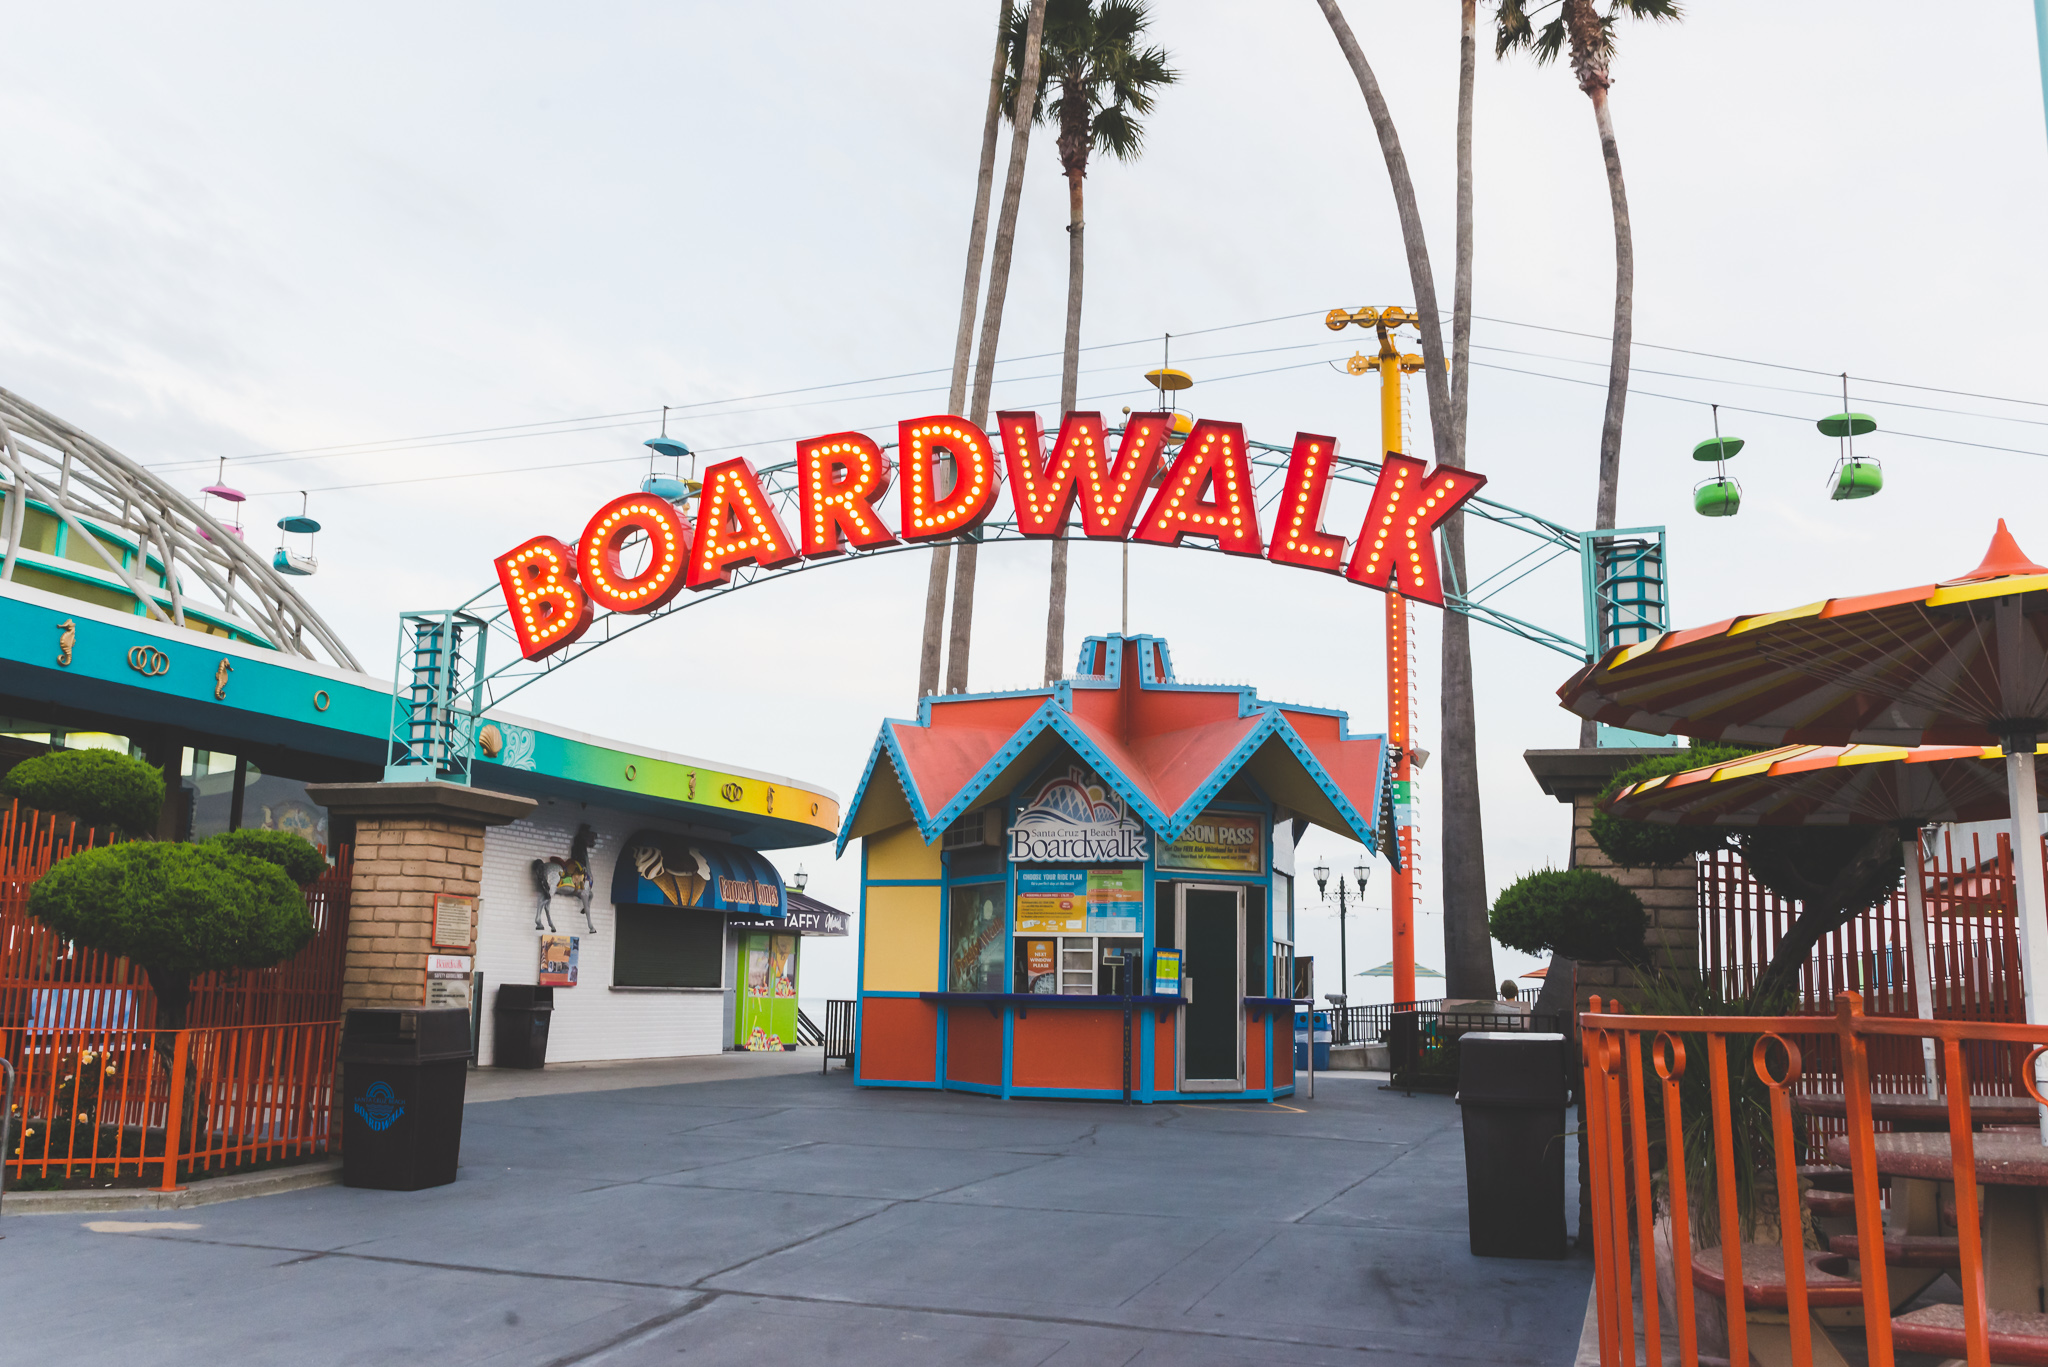 Walking up to the Boardwalk. / 5/3/16 / Santa Cruz, CA